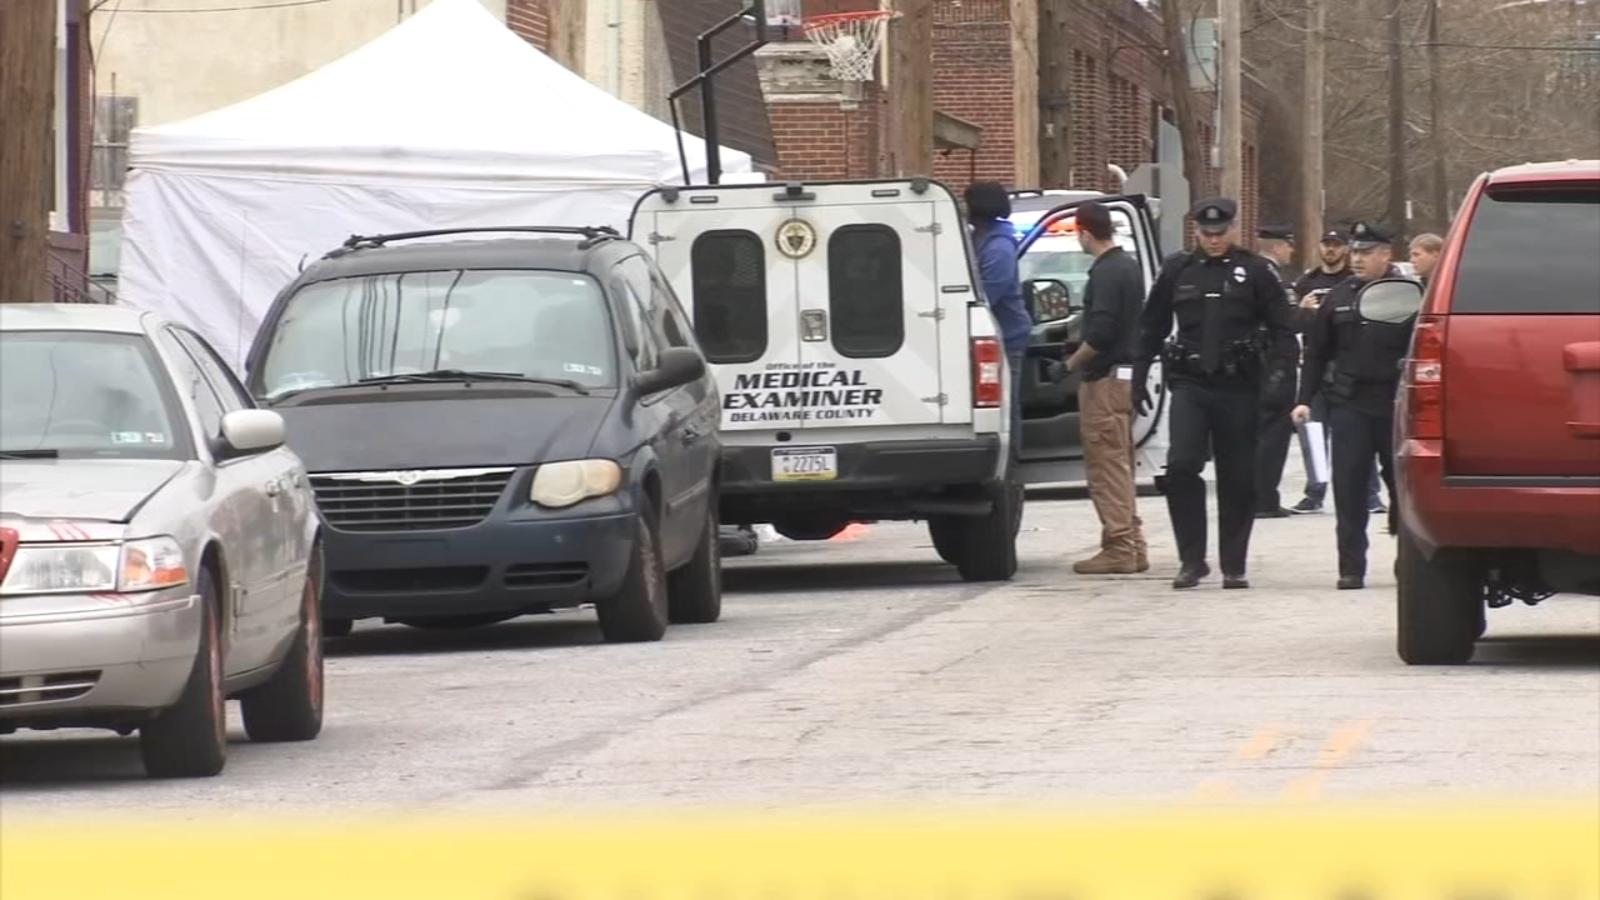 Quadruple shooting leaves 2 teens dead in Chester, Pennsylvania ...